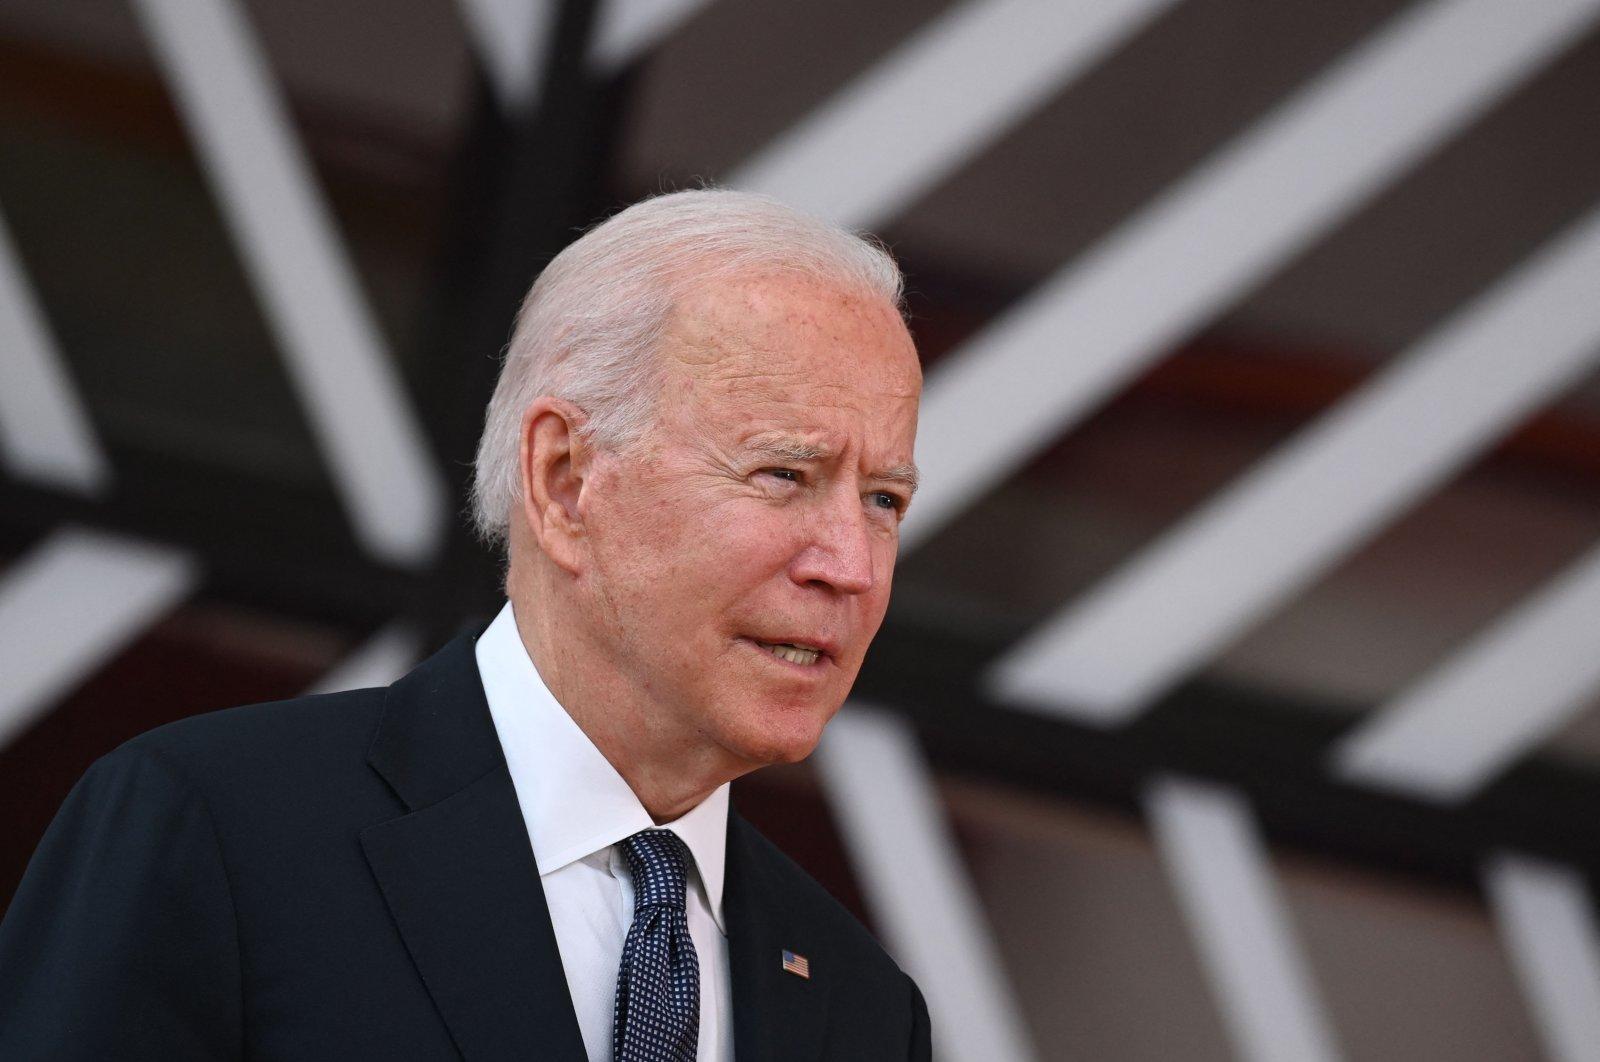 Biden 'feels good' about meeting with Erdoğan at NATO summit